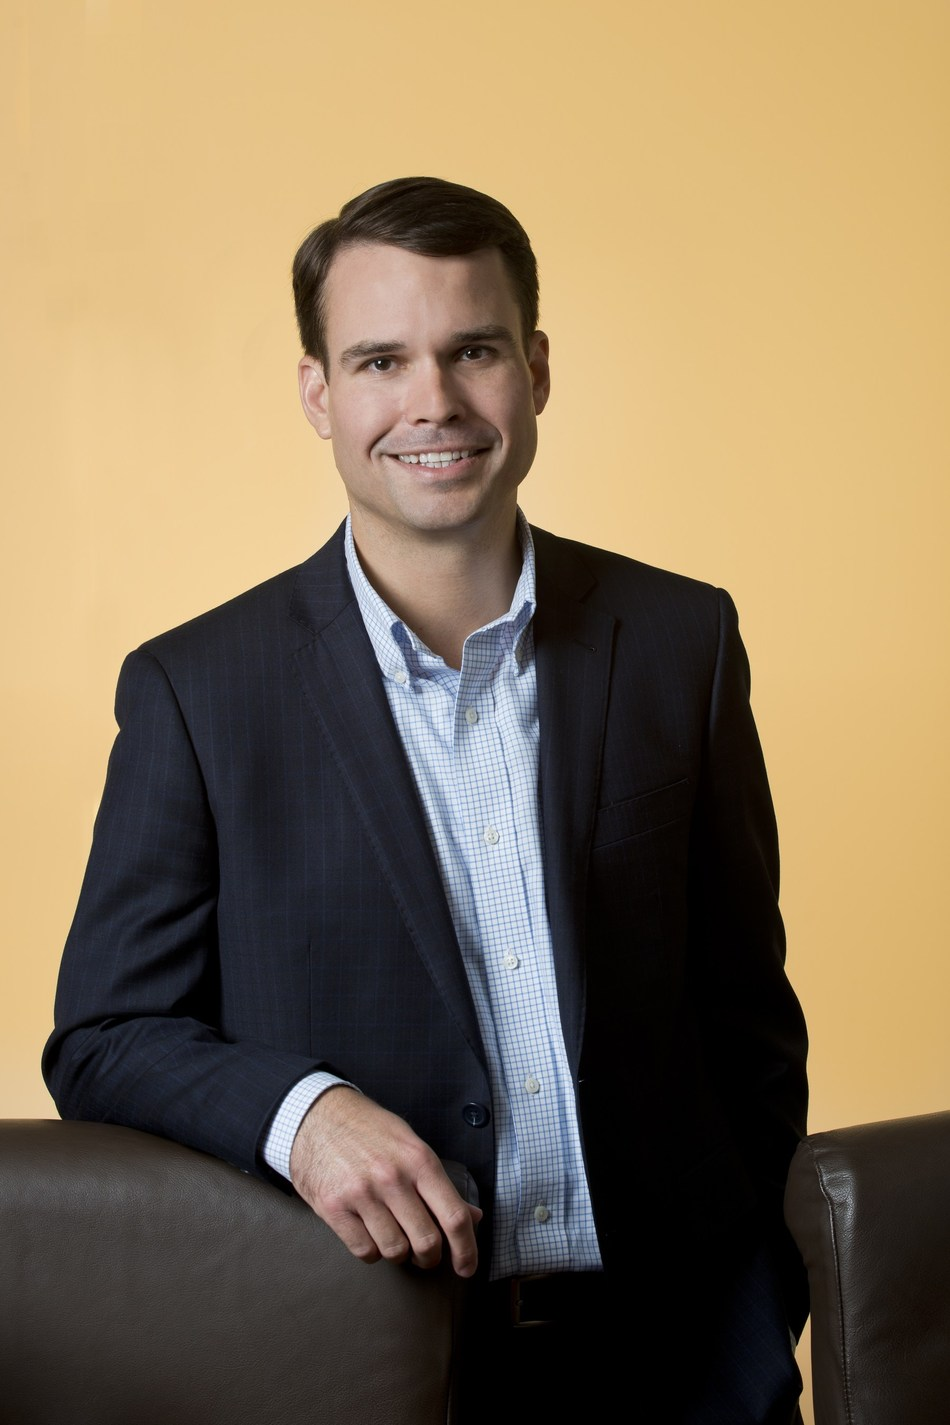 Michael S. Jenkins, Associate Managing Director, Commercial Banking, Oakworth Capital Bank